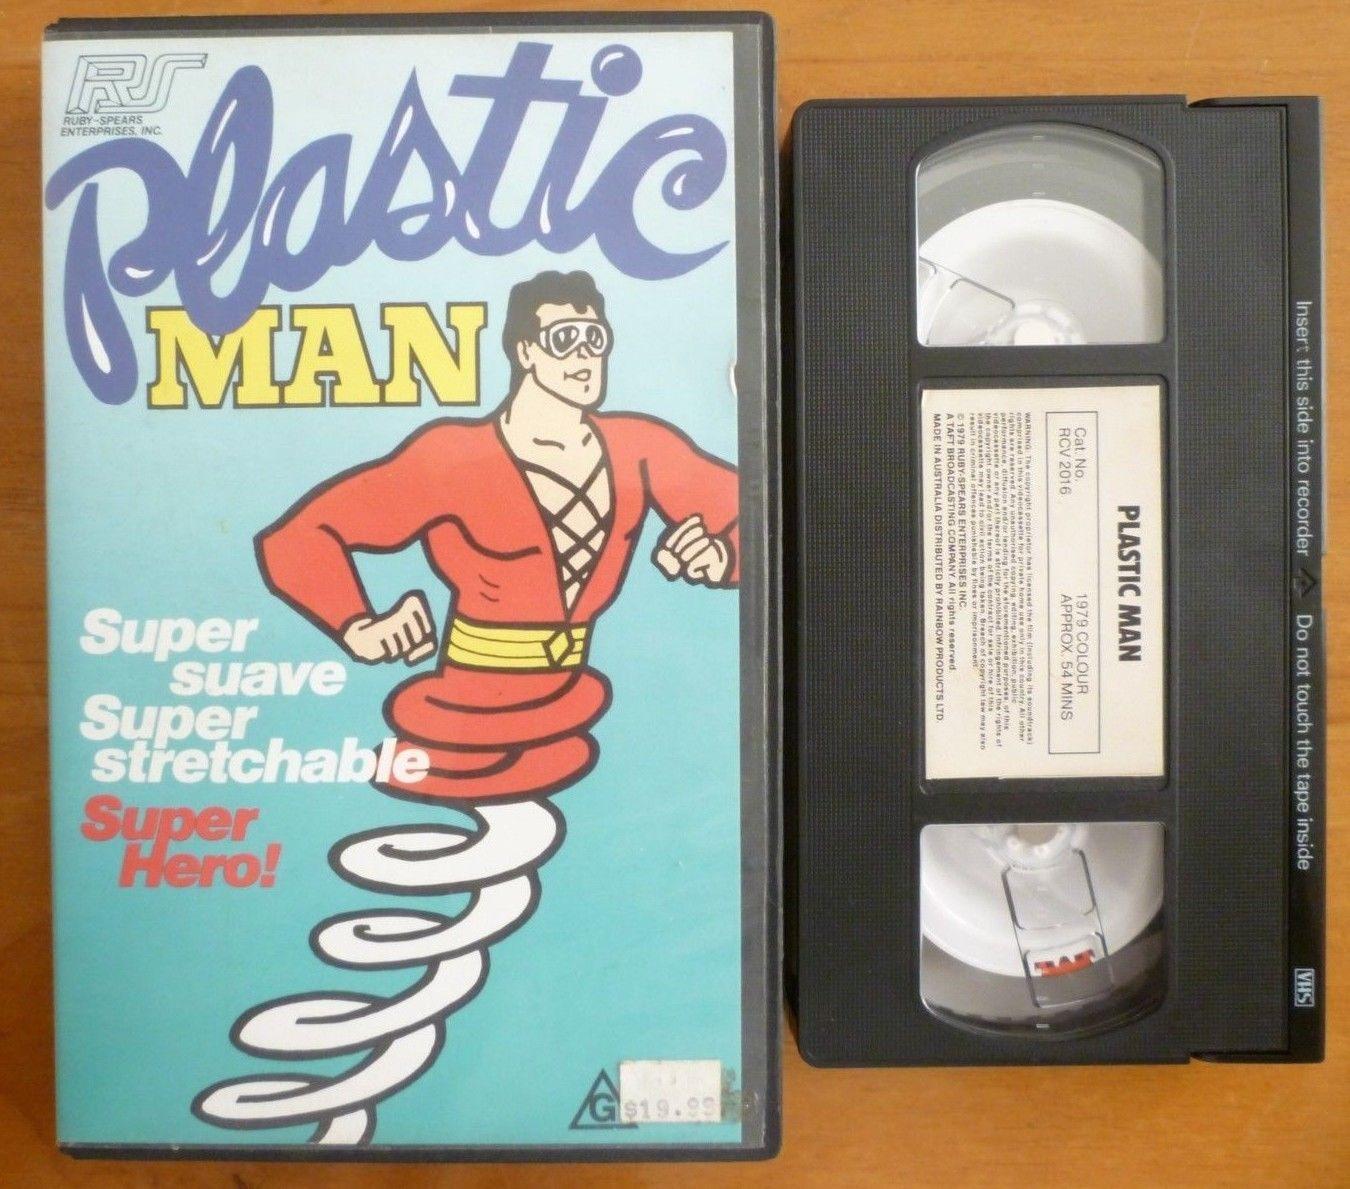 Plastic Man: Super Suave, Super Stretchable, Super Hero!